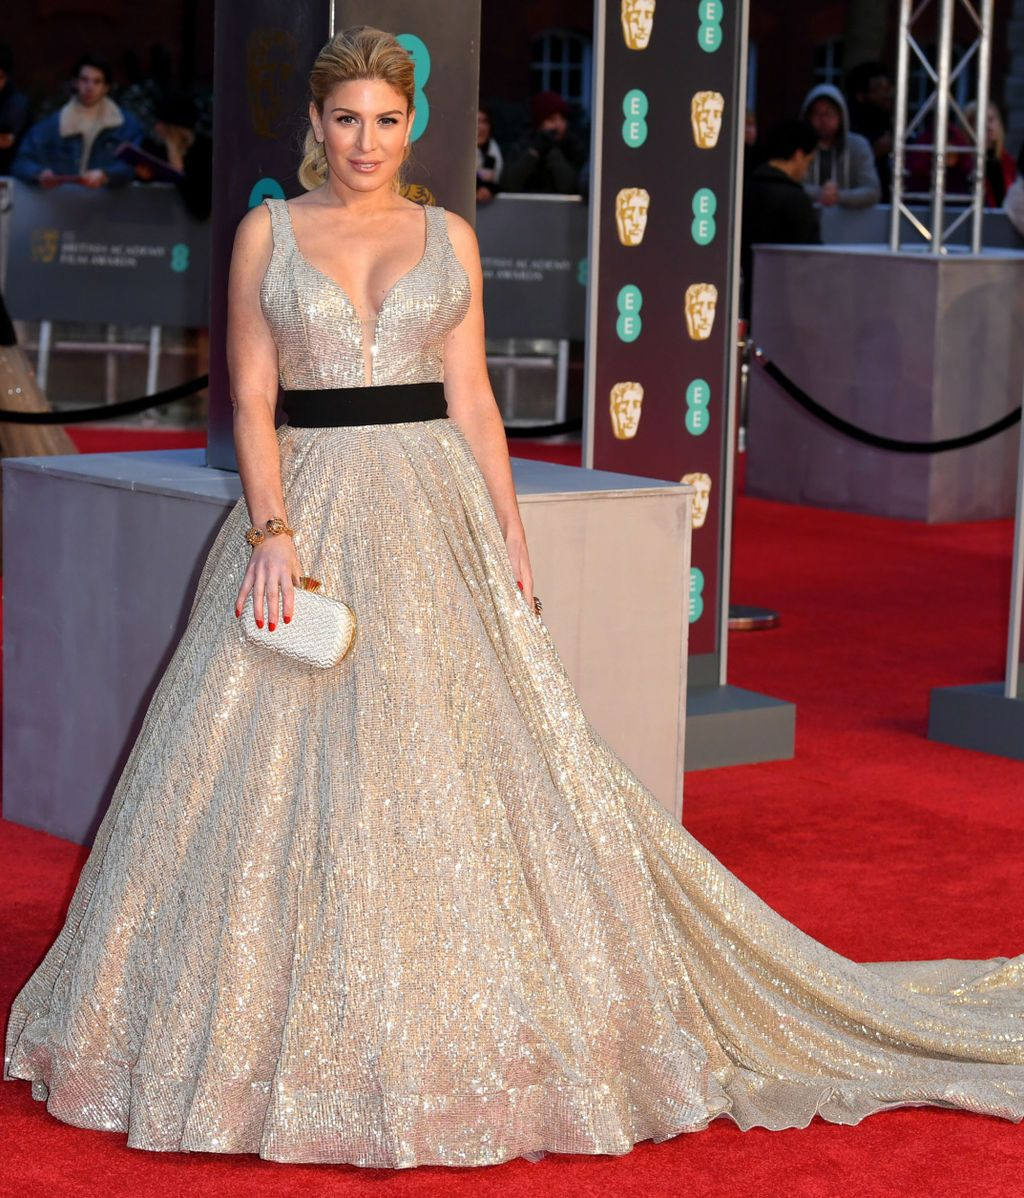 Hofit Golan en la alfombra roja de los BAFTA